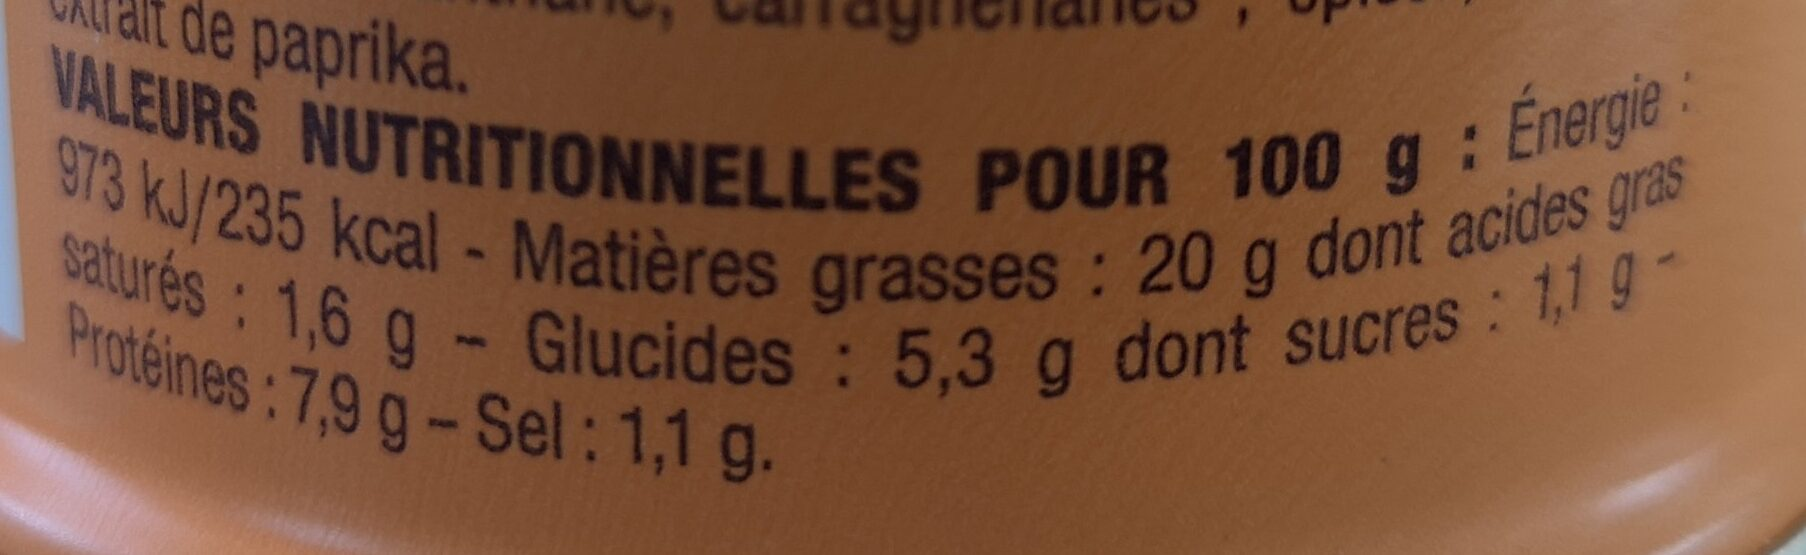 Nos toasts chauds Crevettes au calvados - Nutrition facts